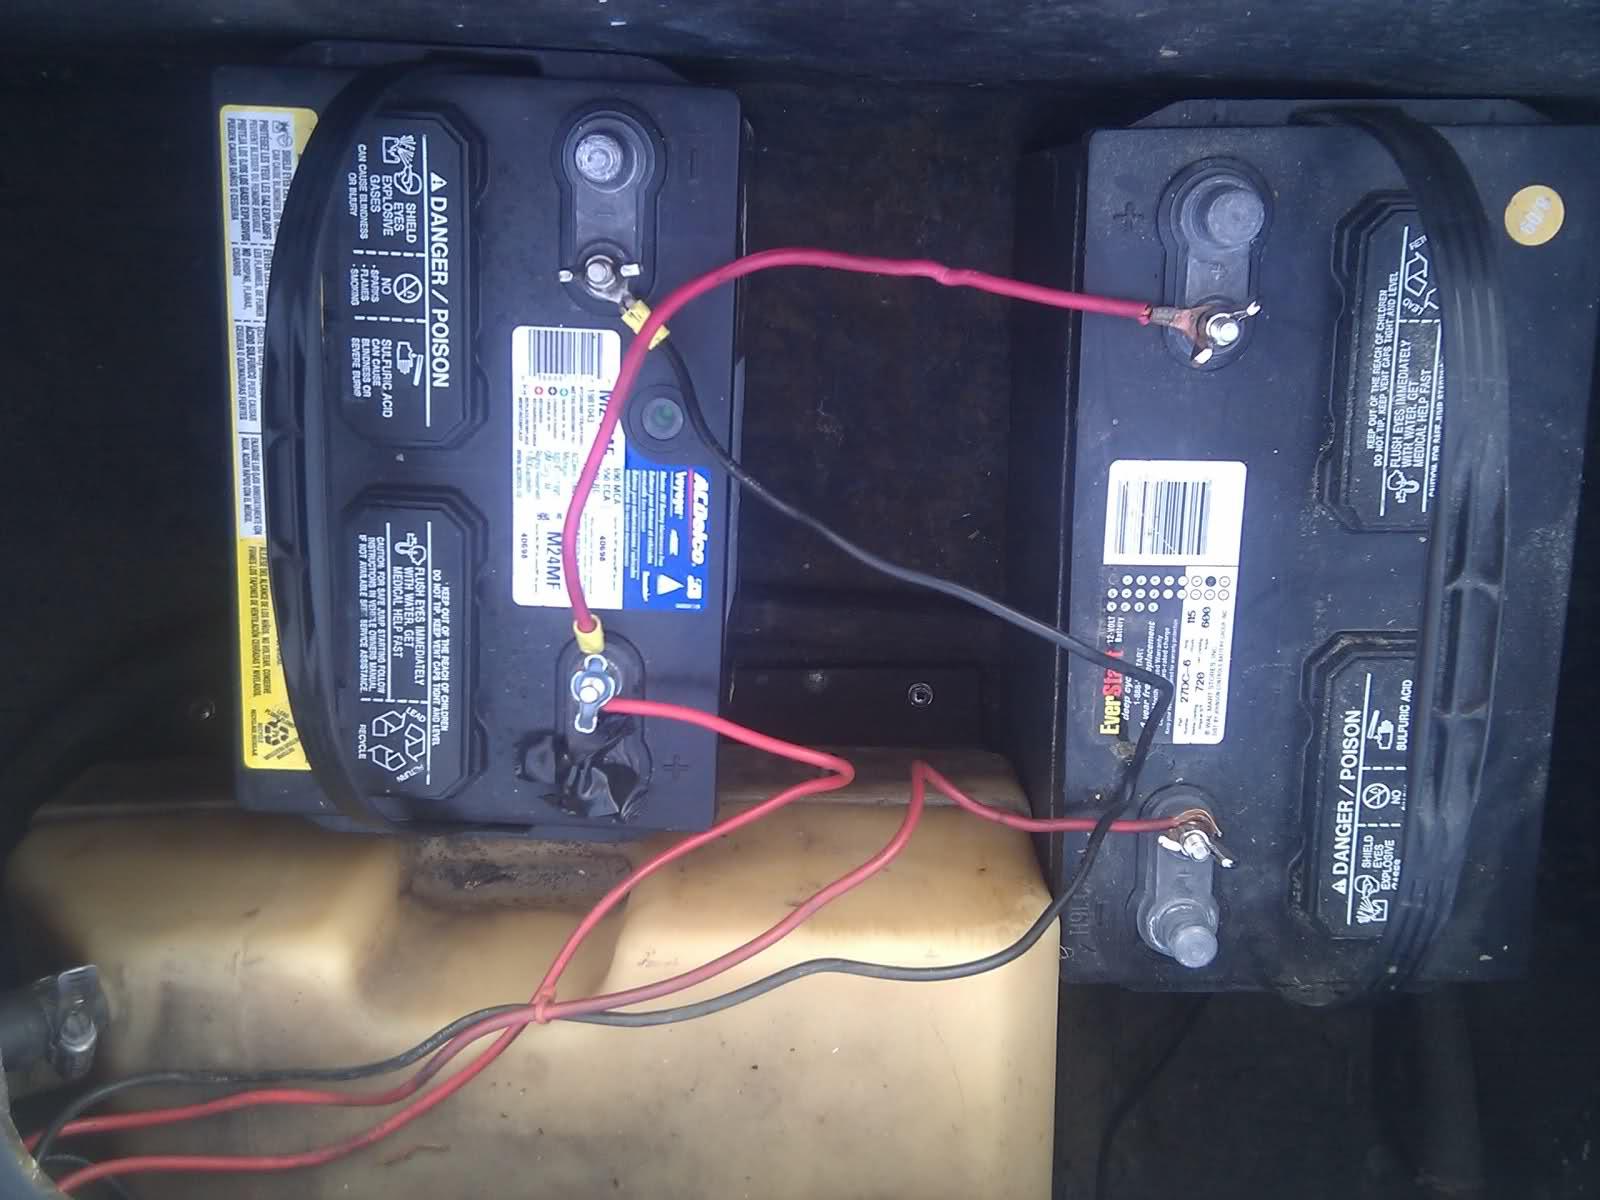 Boat Trolling Motor 24V Battery Wiring Diagram | Wiring Library - 24 Volt Trolling Motor Battery Wiring Diagram